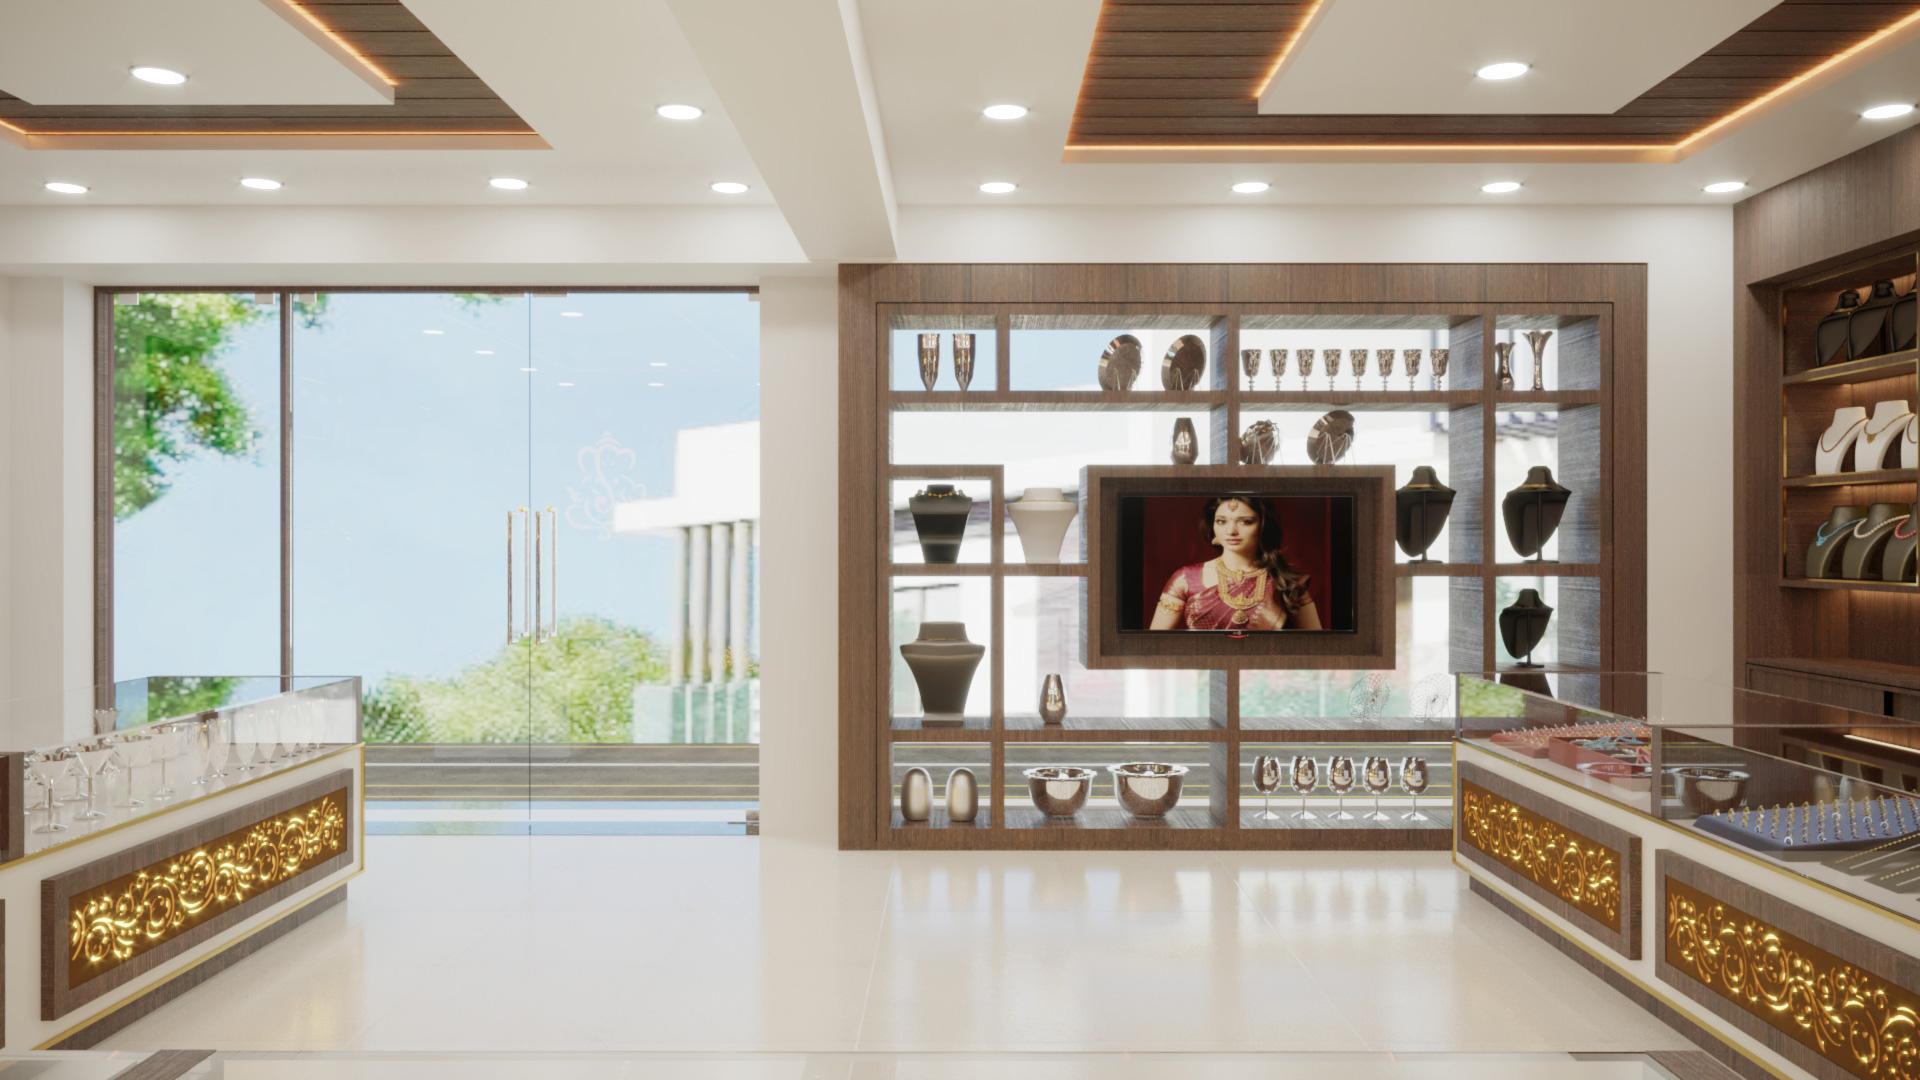 Viswasri Silver Jewelry Interior by TriShades 2